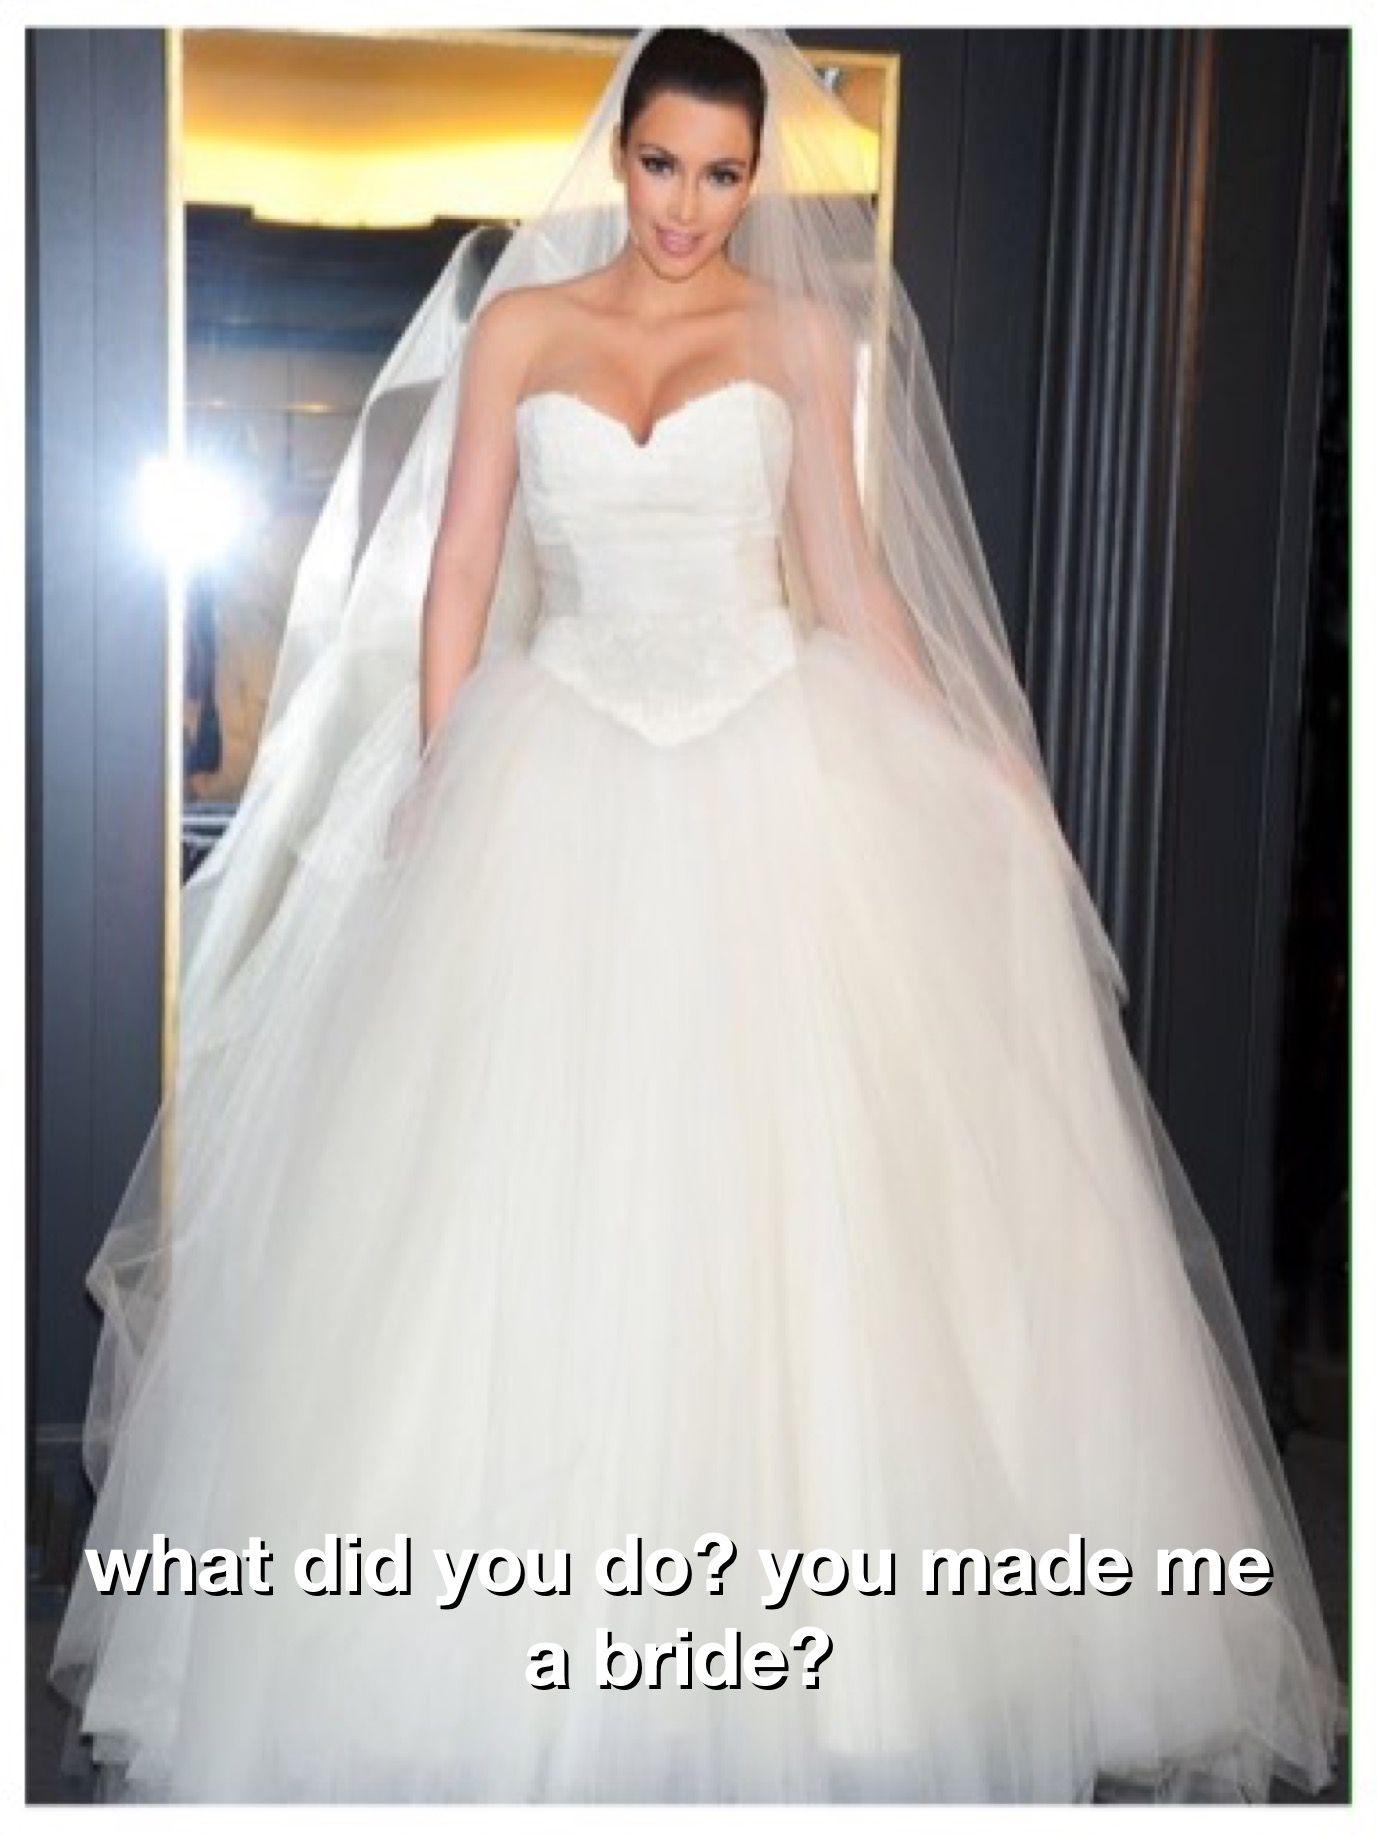 Pin By Eddie S Cycle On Tg Tales Of Terror Fancy Wedding Dresses Kim Kardashian Wedding Dress Wedding Guest Dress [ 1836 x 1377 Pixel ]